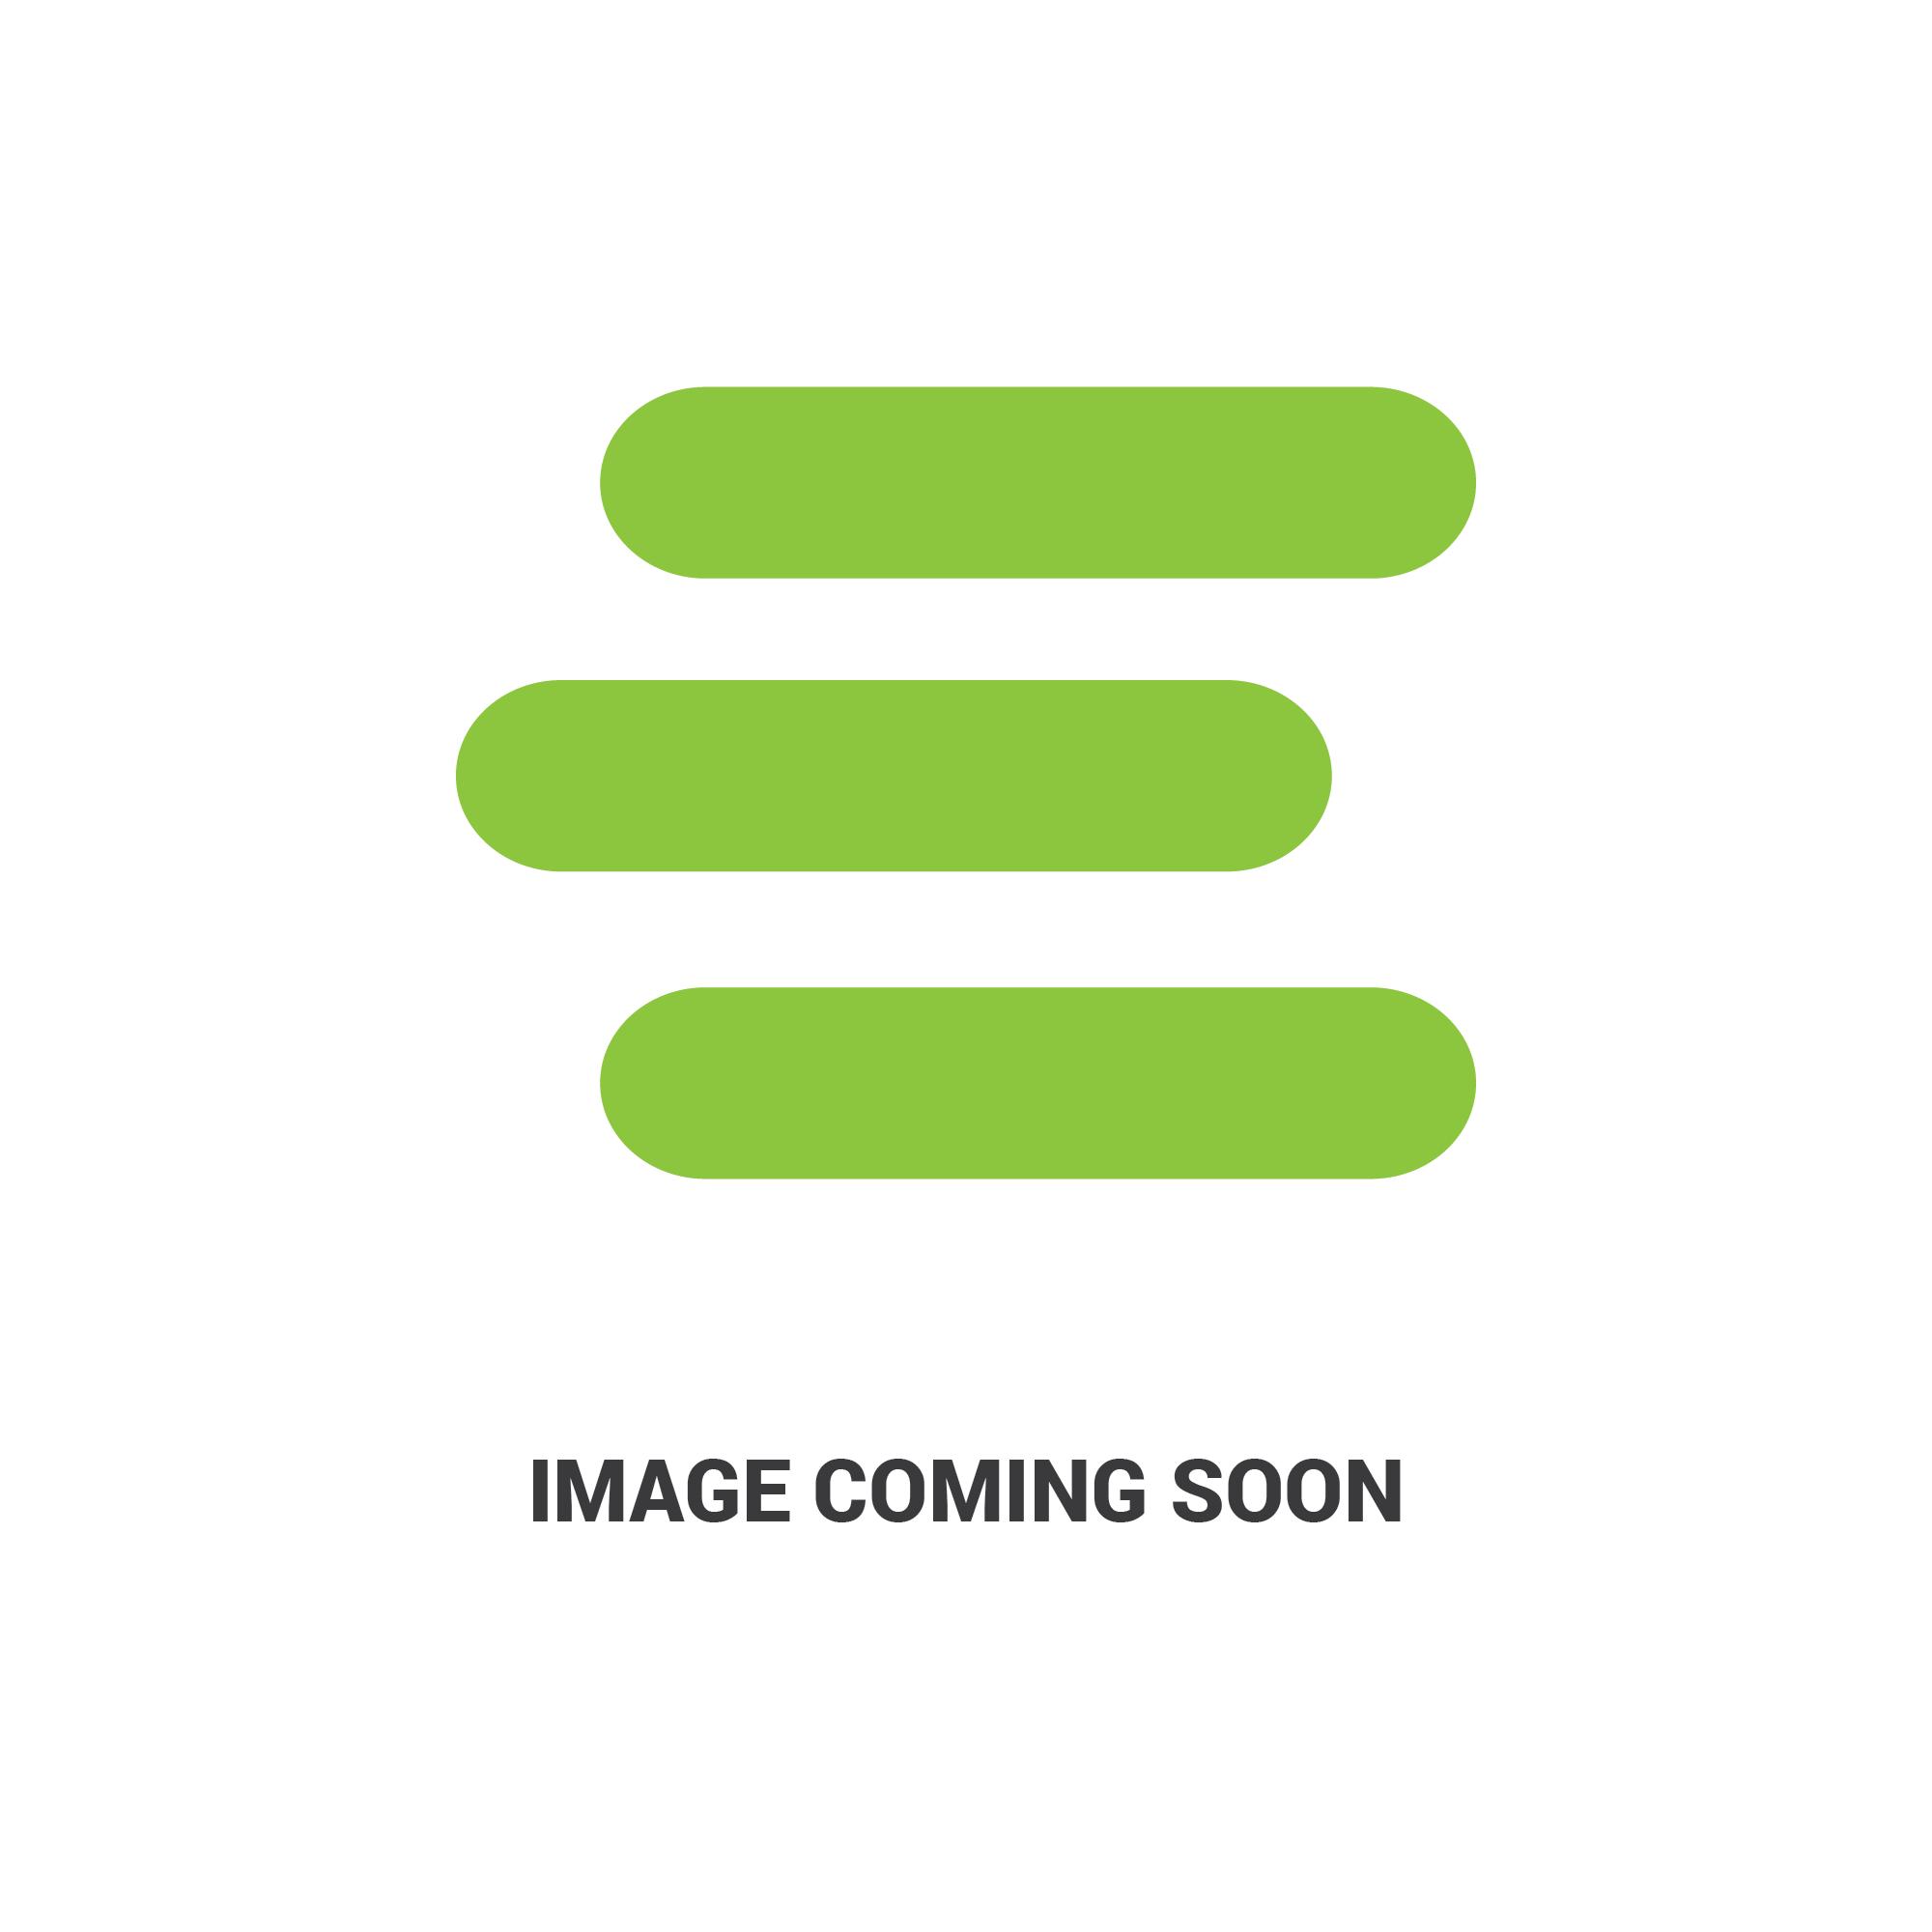 E-S17K030011edit 1161.jpg